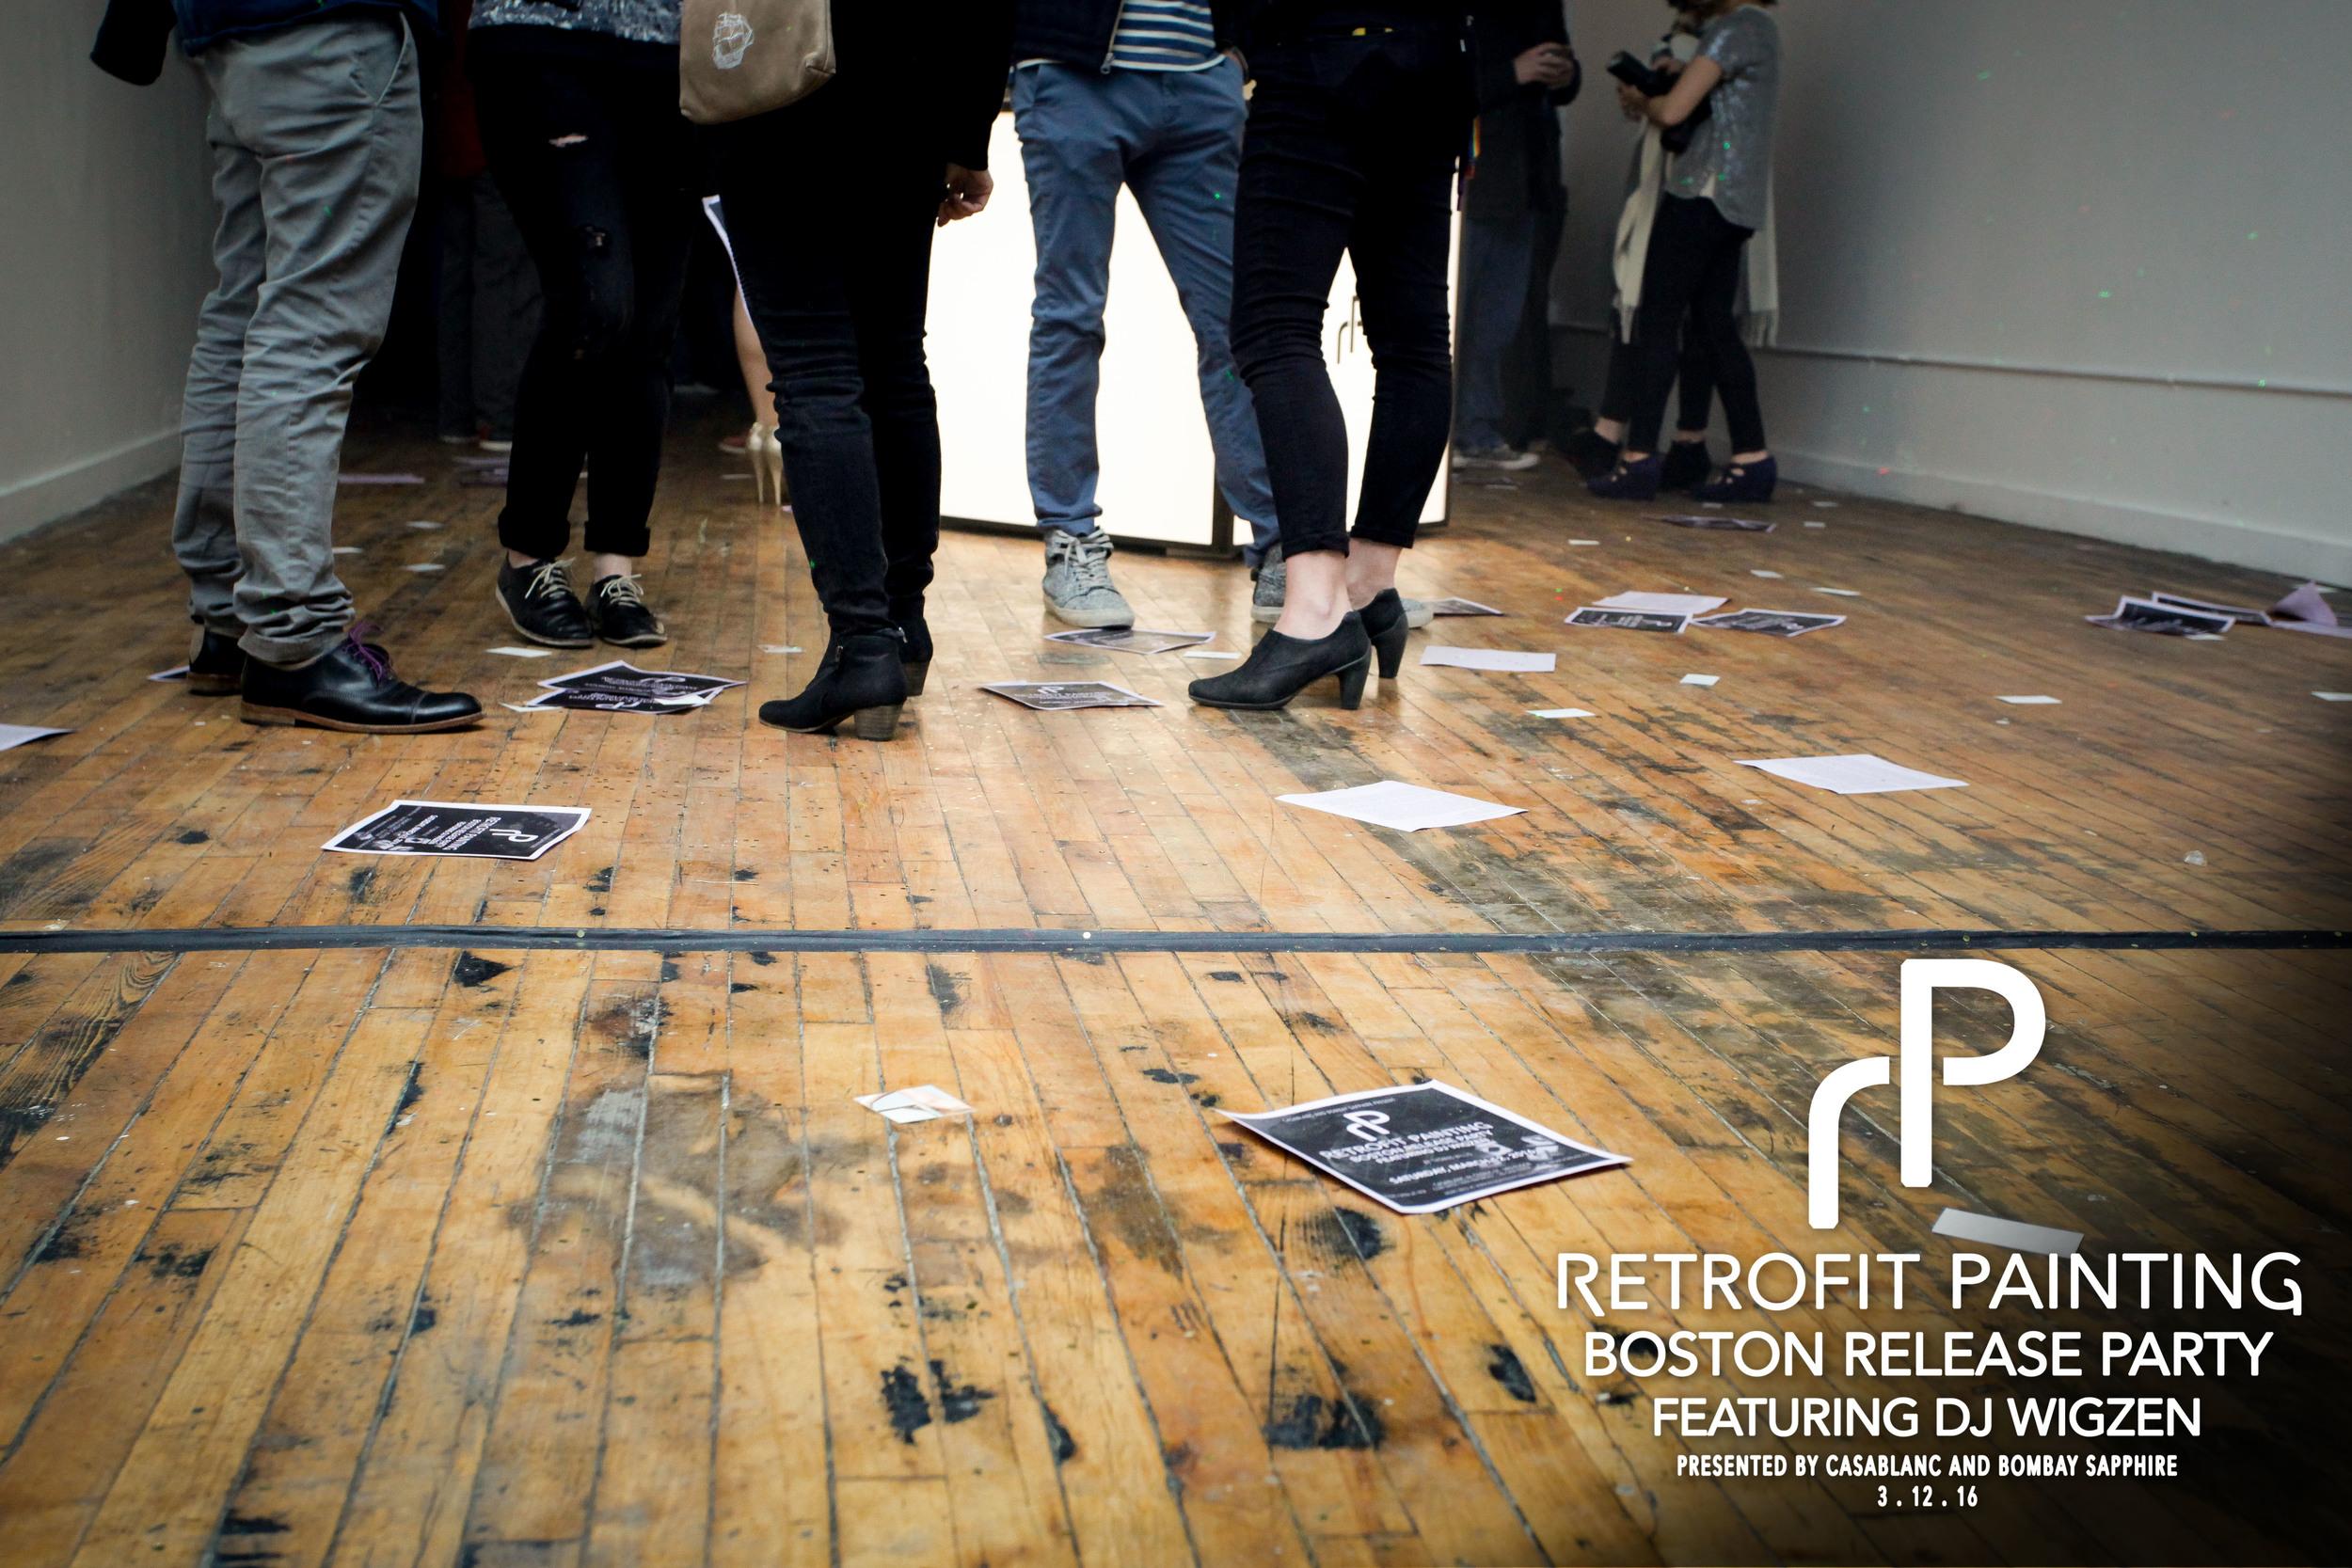 Retrofit Painting Boston Release Party 0051.jpg